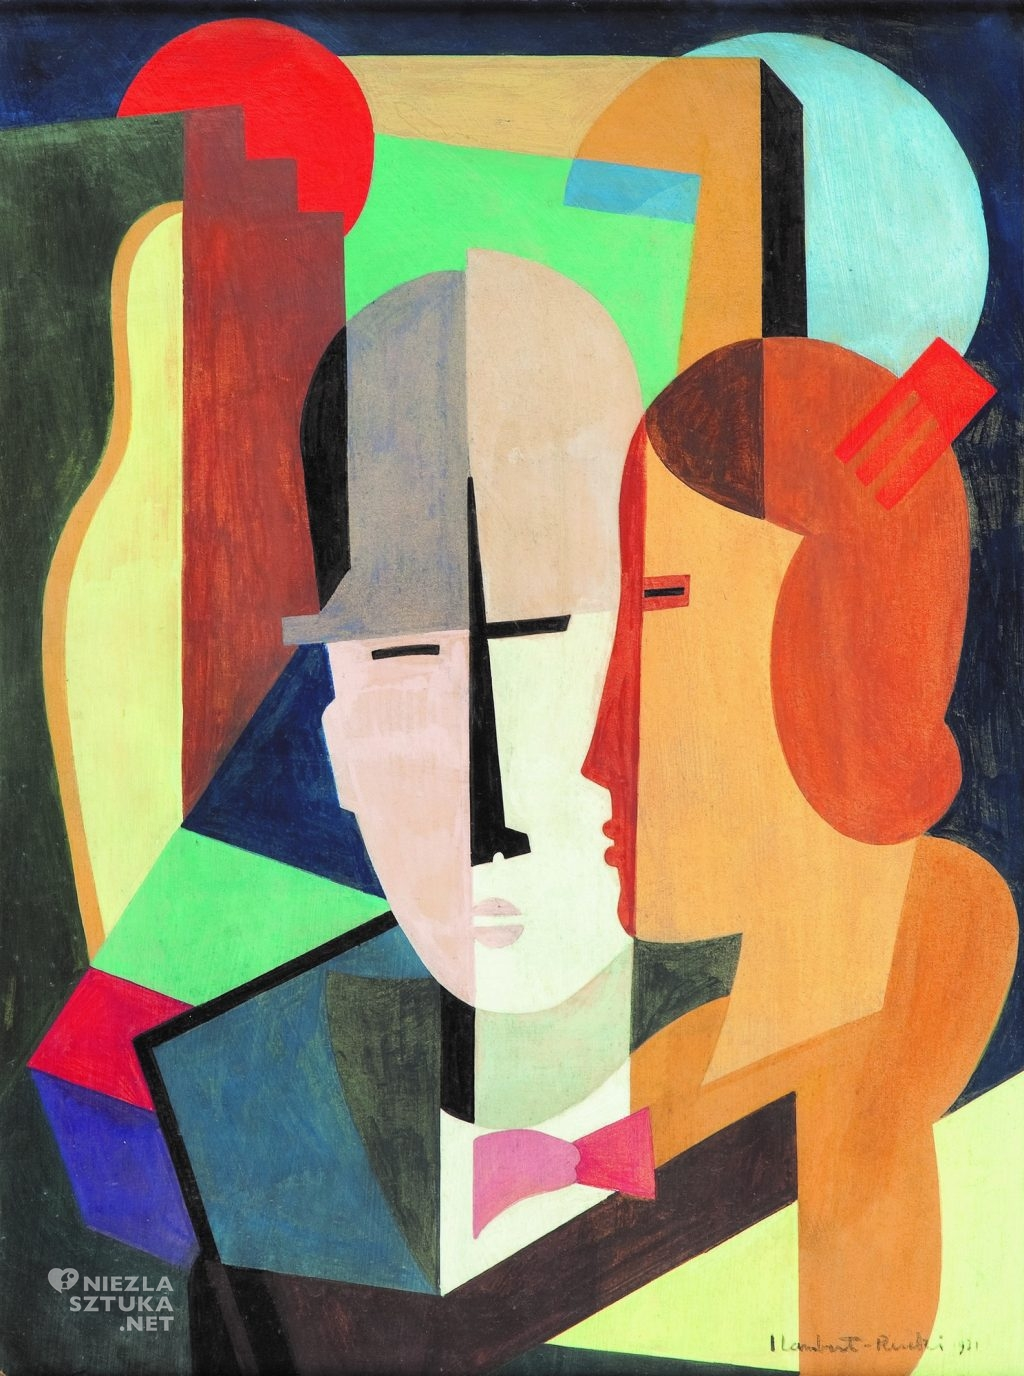 "Jean Lambert-Rucki, ""Para"", 1931, 48 x 36 cm, olej na płycie, fot. dzięki uprzejmości Villi la Fleur"